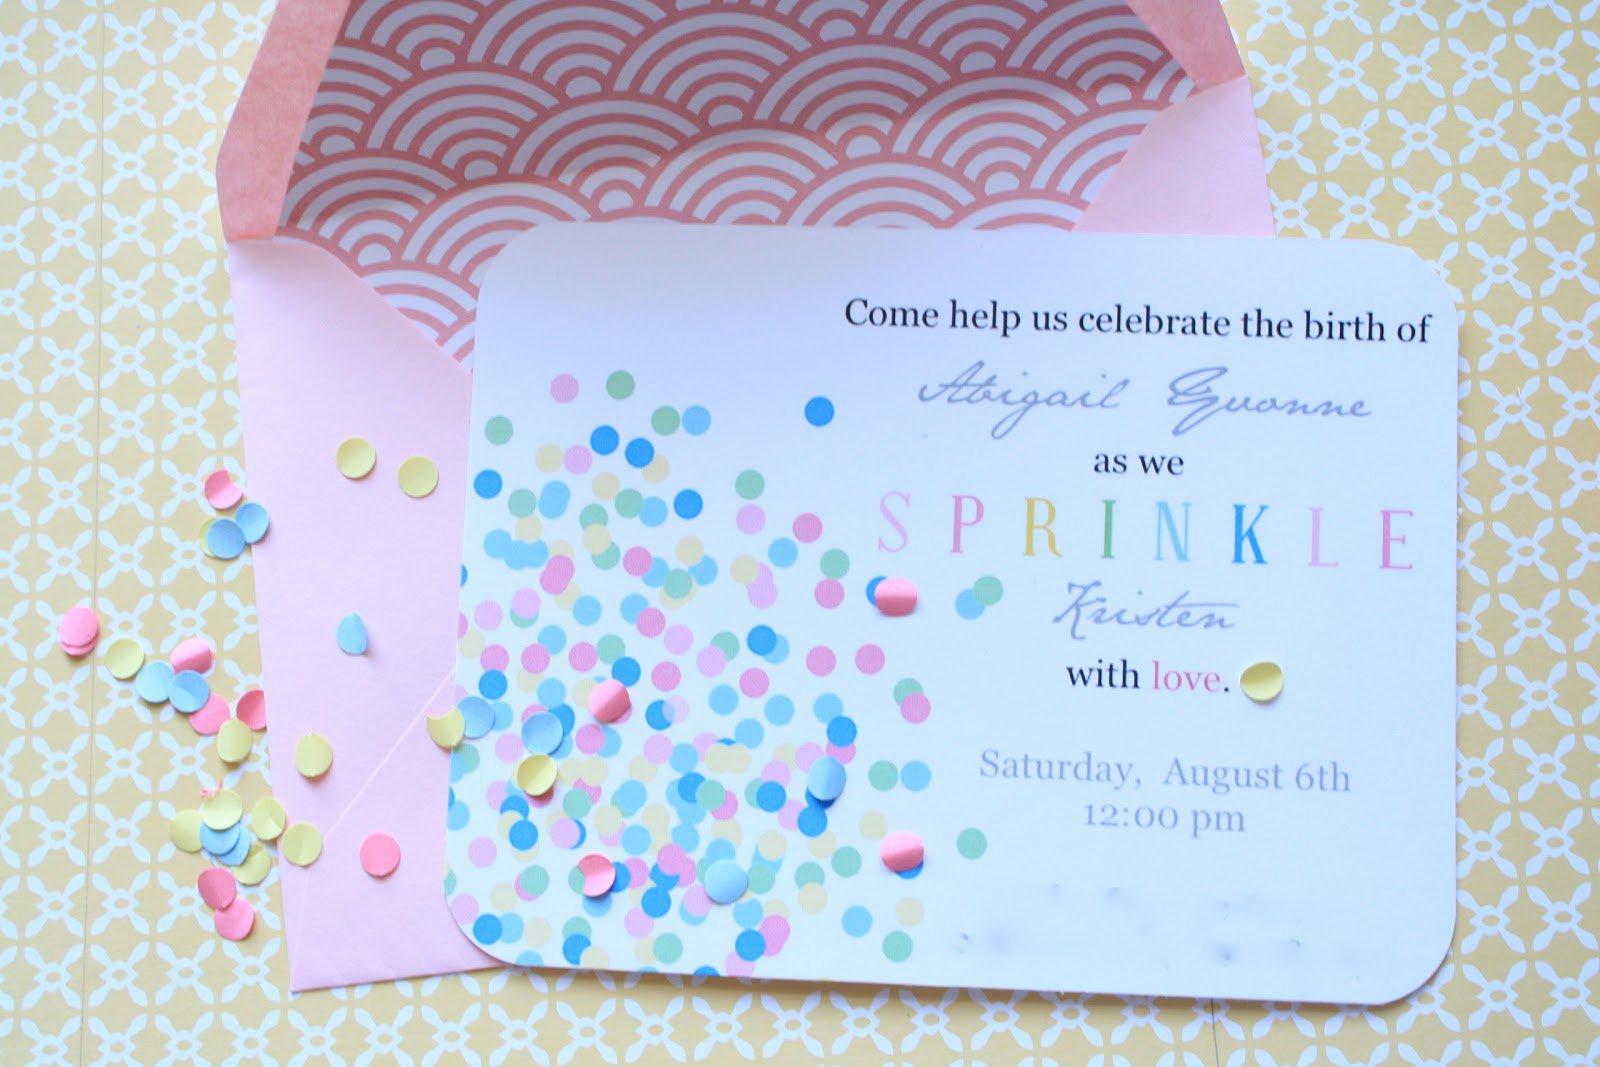 Second Baby Shower Invitation Wording Sprinkle